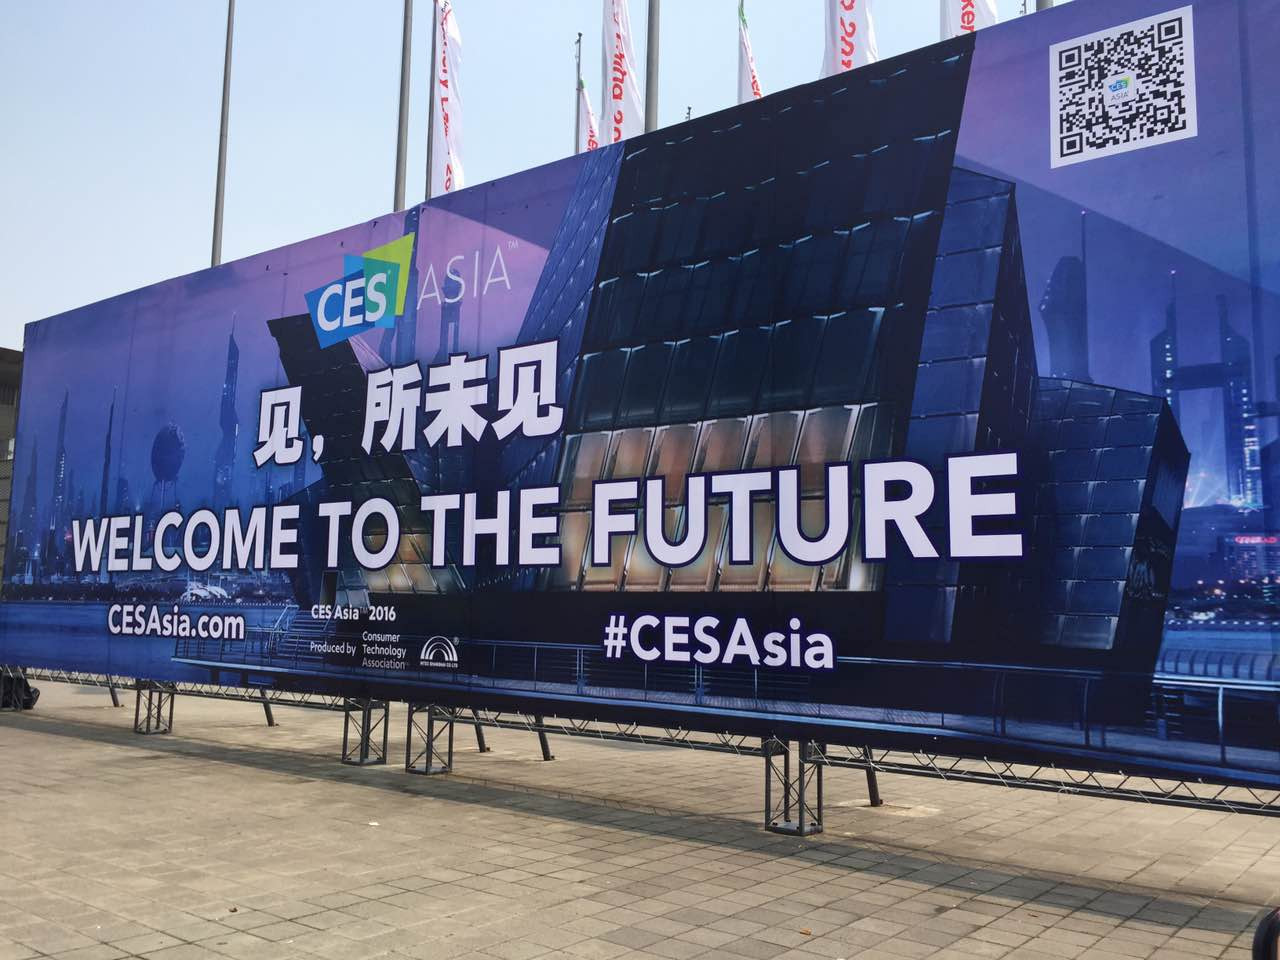 CES Asia 2016开幕 全球共375家知名企业参展